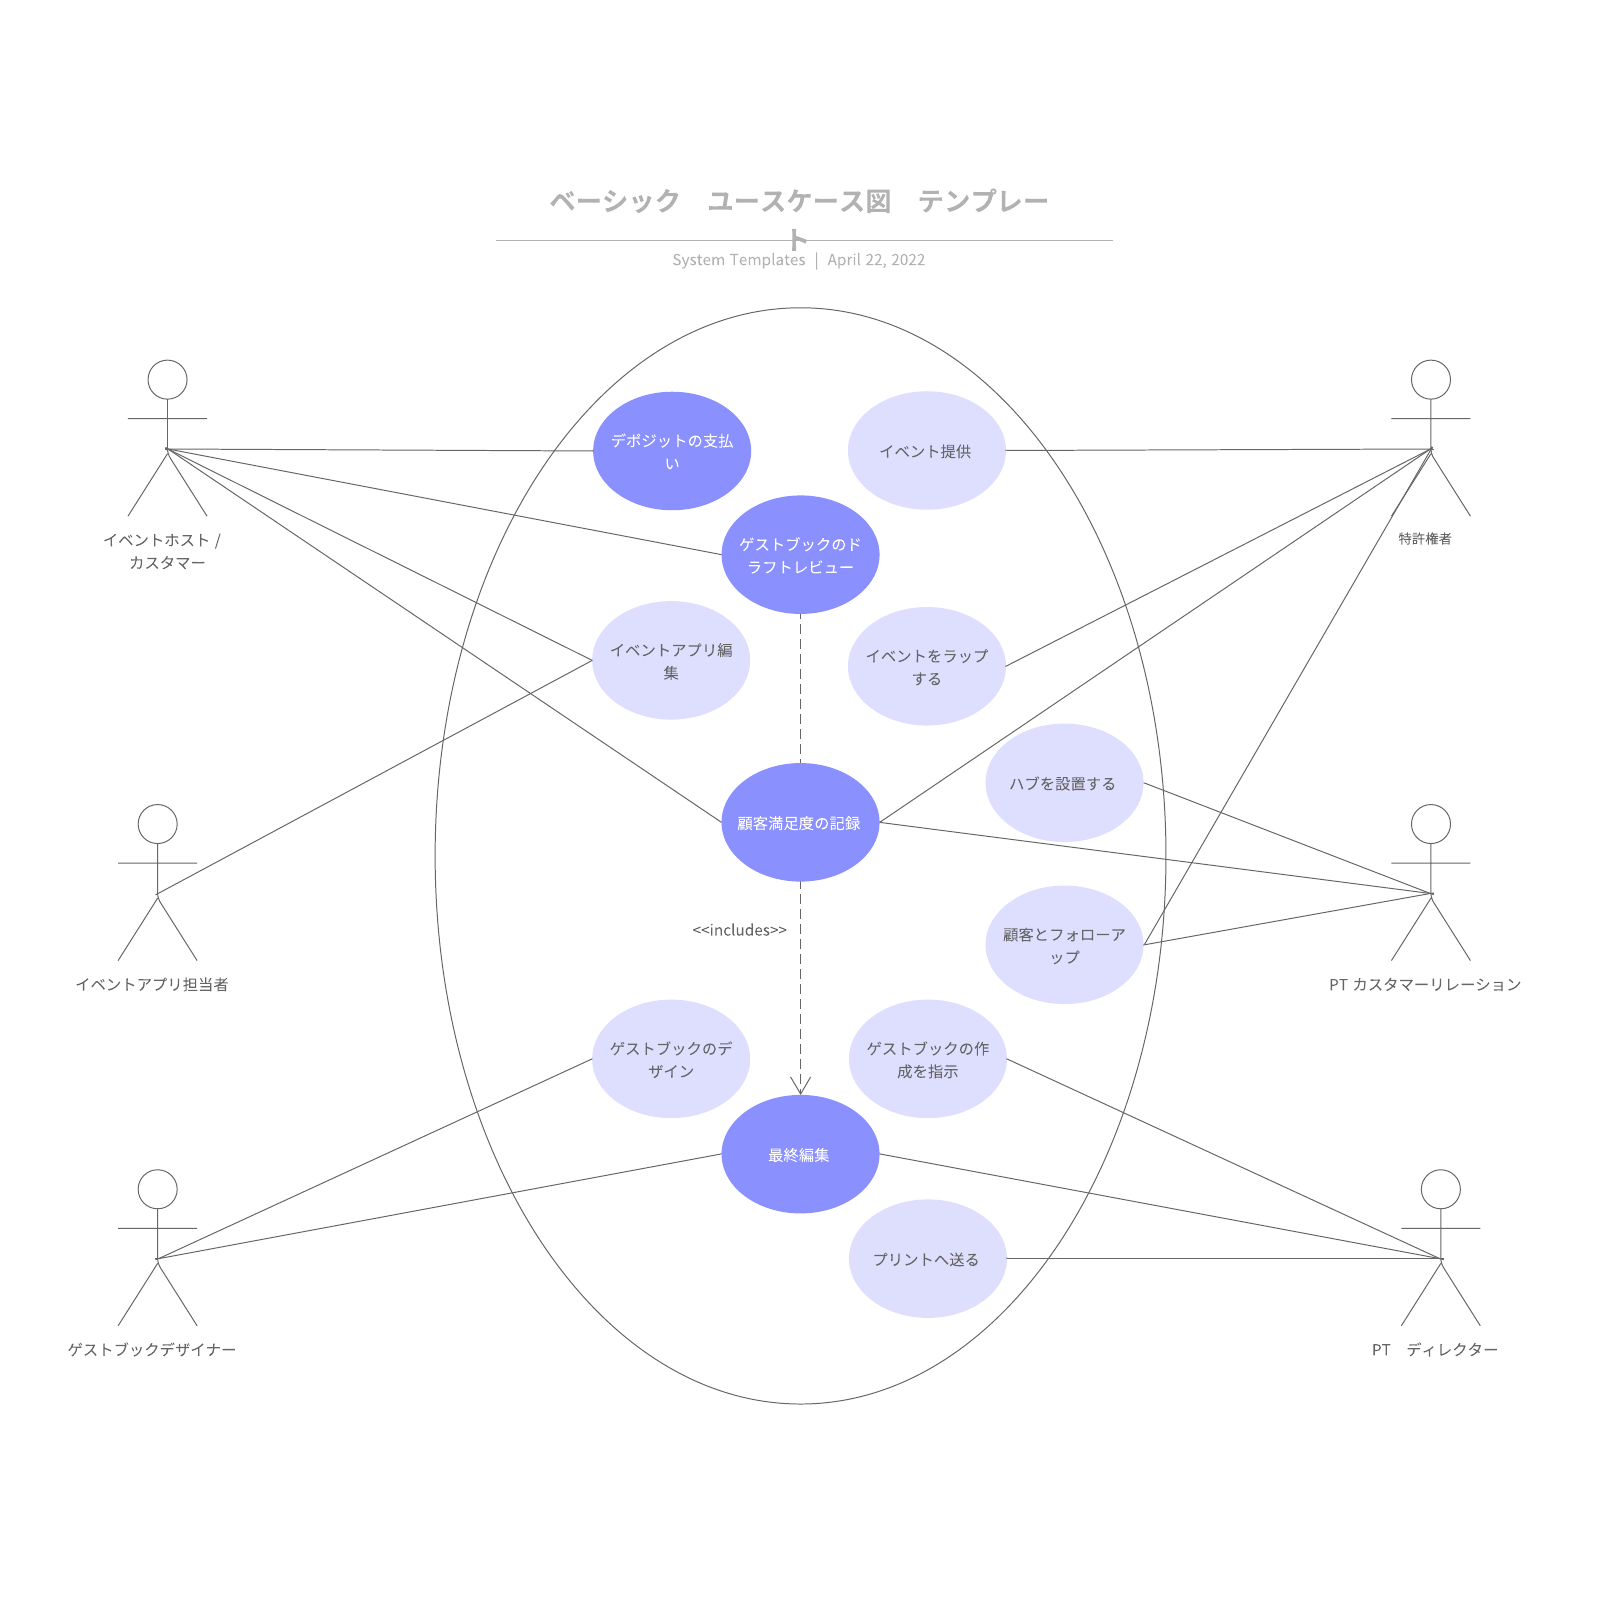 UMLユースケース図の例